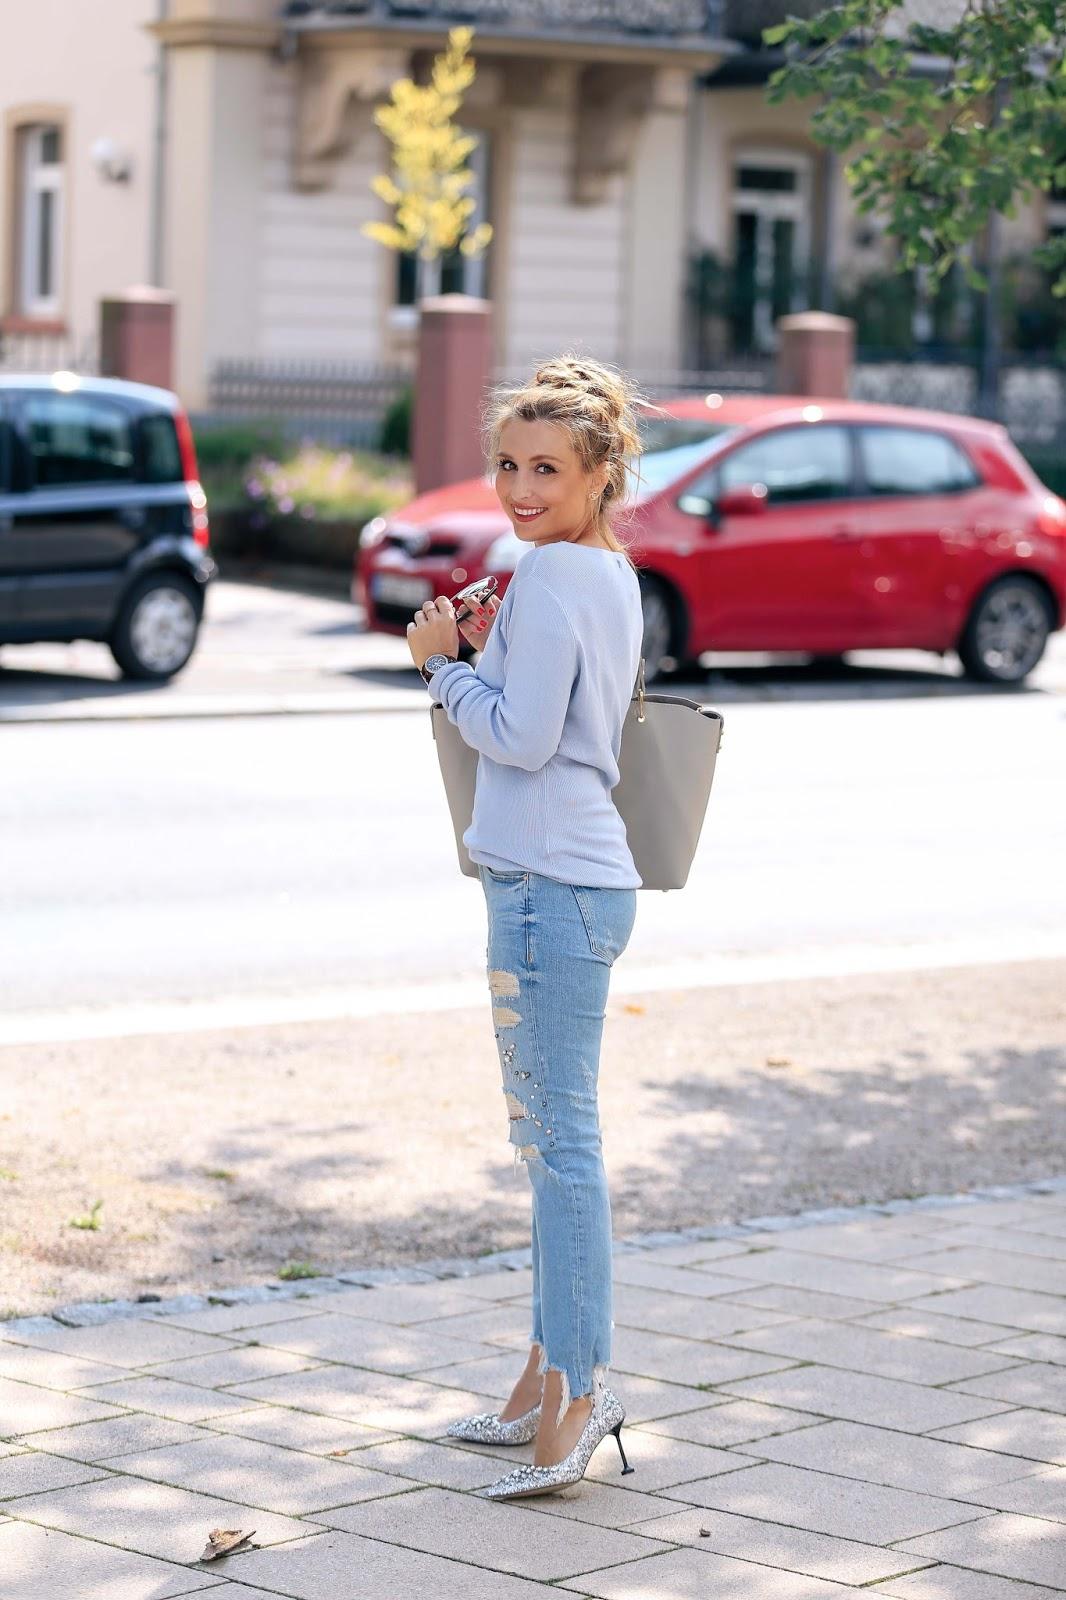 glitzer-pumps-miumiu-Fashionblogger-aus-deutschland-deutsche-fashionblogger-blauer-pullover-fashionstylebyjohanna